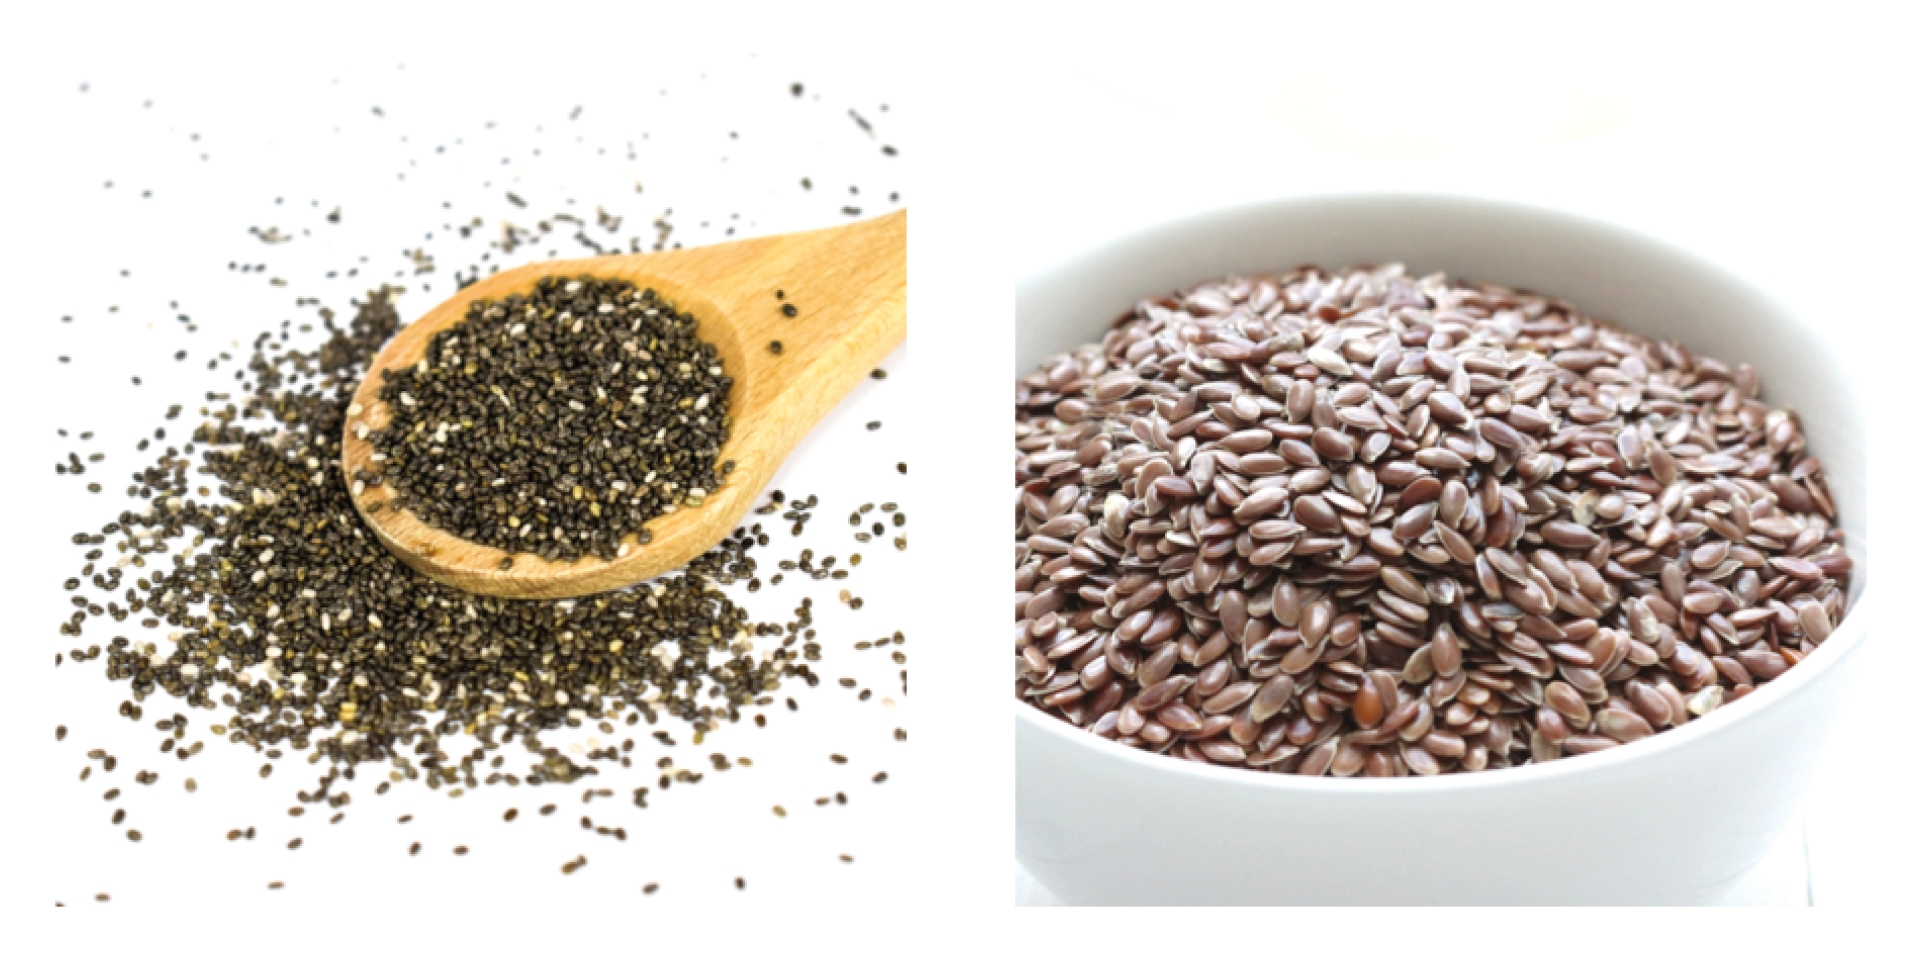 Superfood, nachhaltig, Lebensmittelverschwendung, Umwelt, umweltbewusst